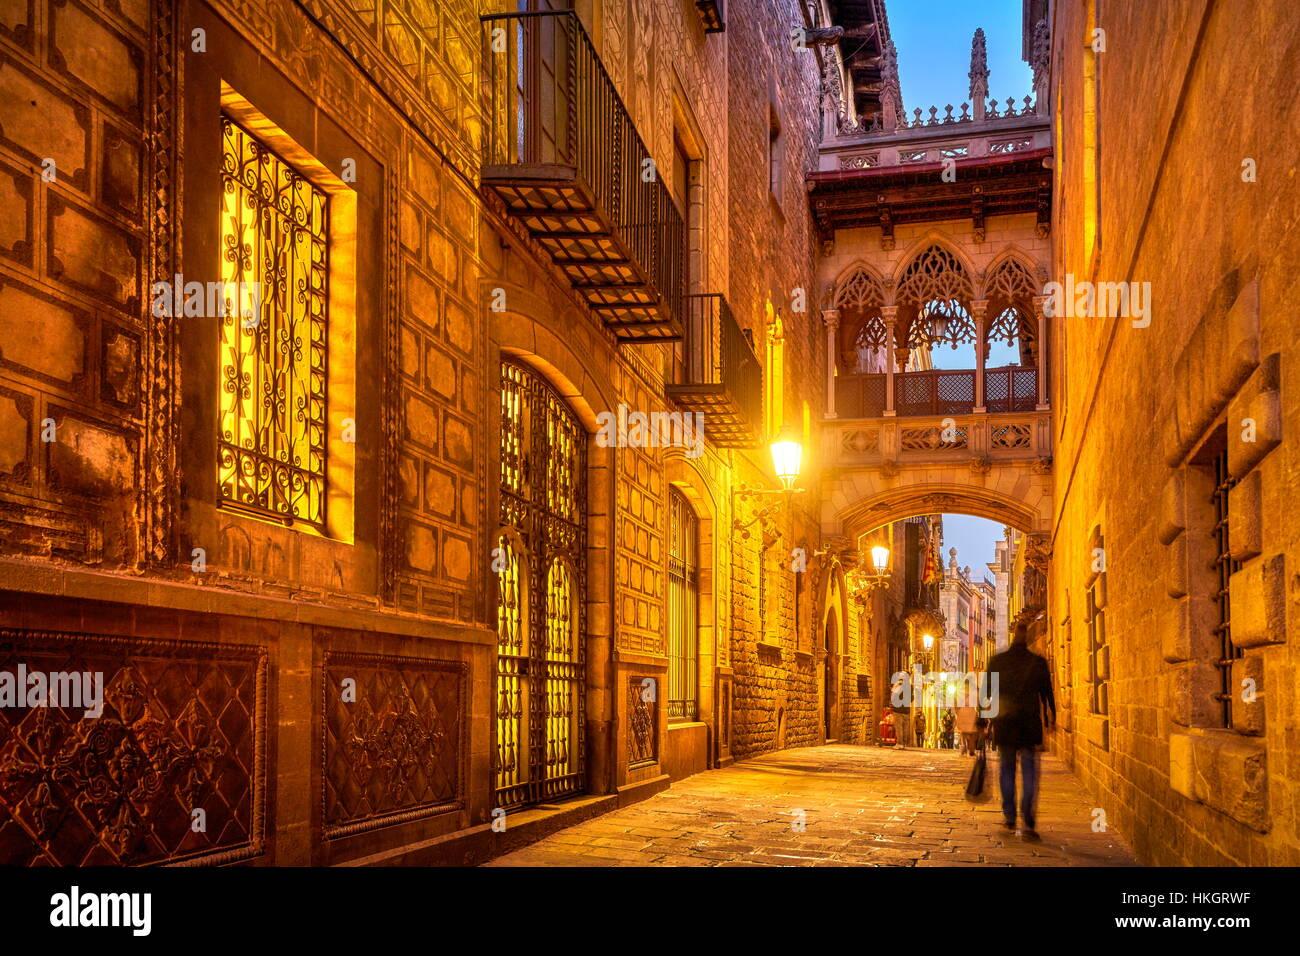 Carrer del Bisbe Street at evening, Barri Ghotic Quarter, Catalonia, Spain - Stock Image